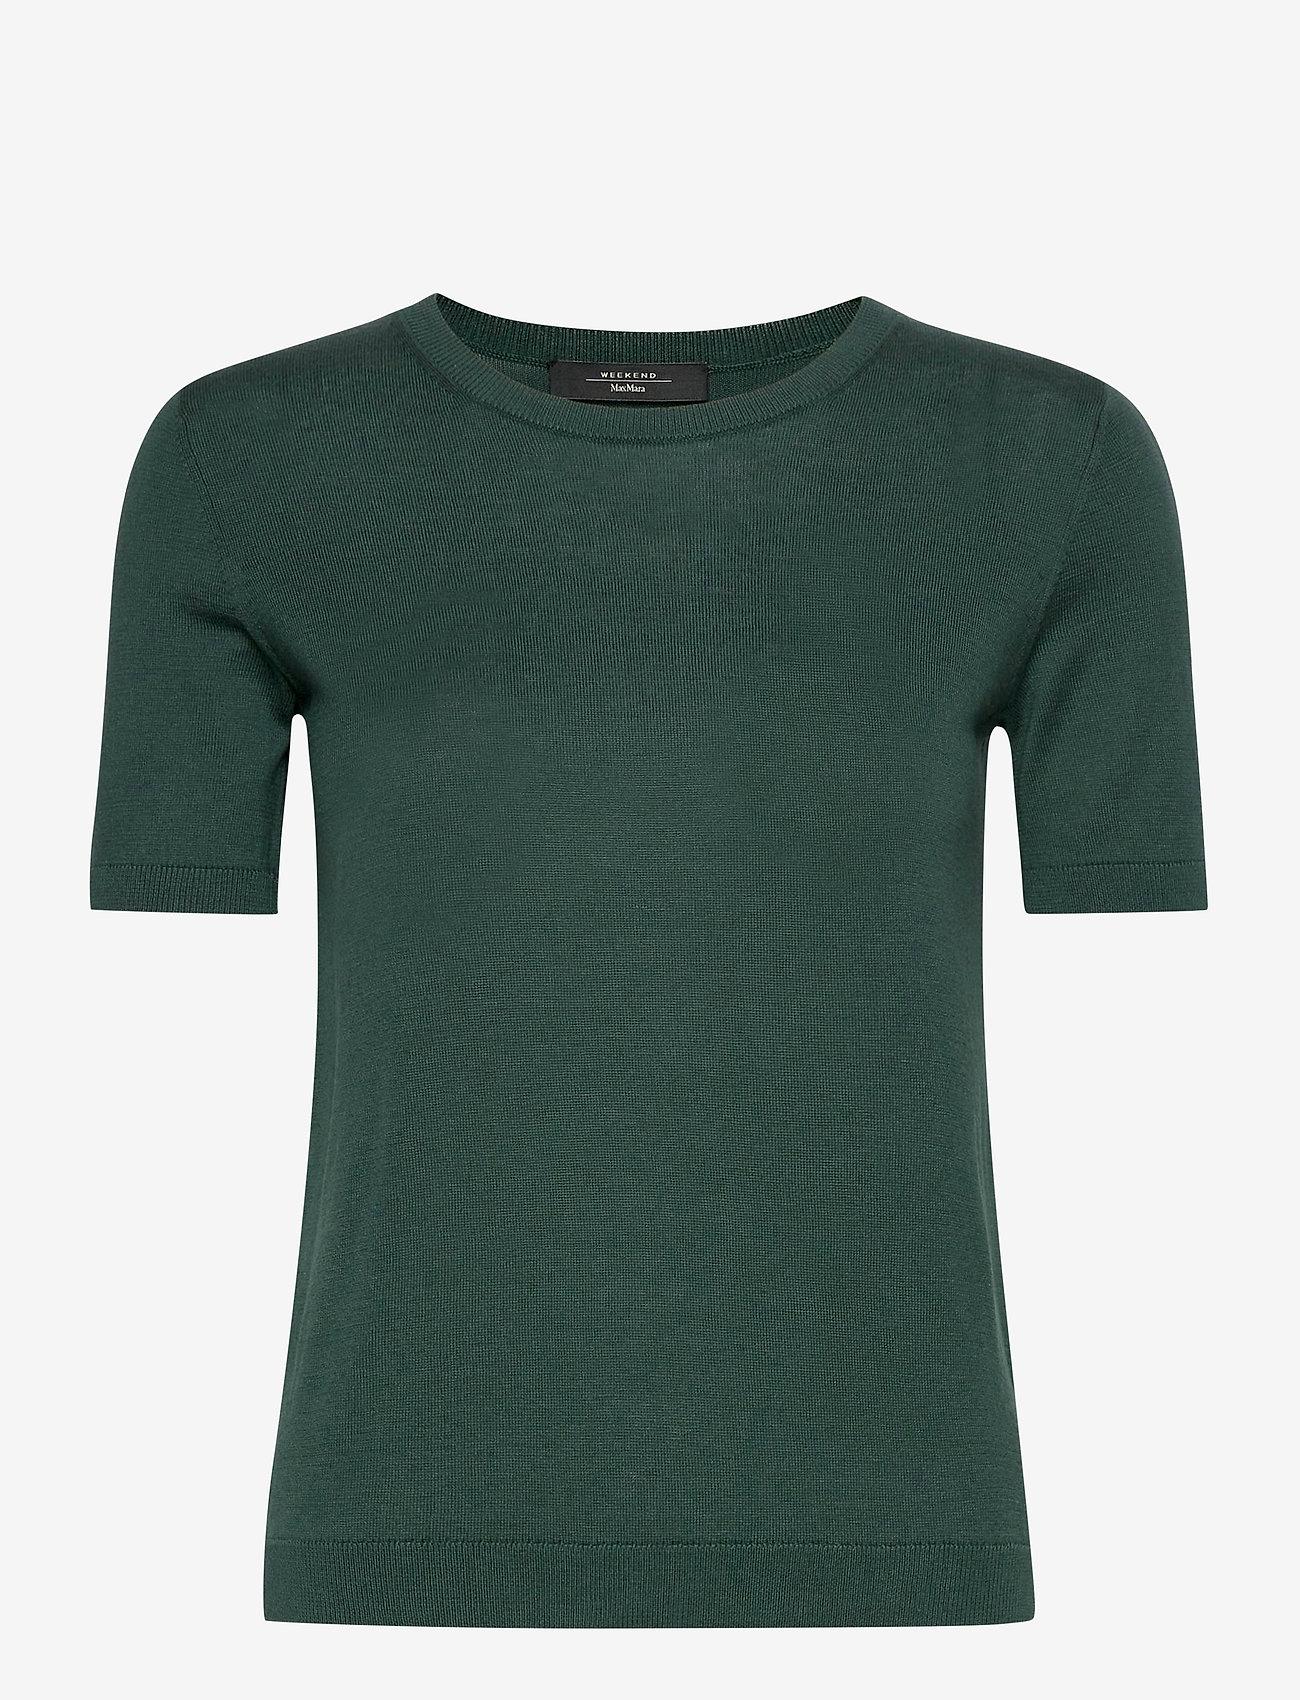 Weekend Max Mara - CAIRO - gebreide t-shirts - dark green - 0